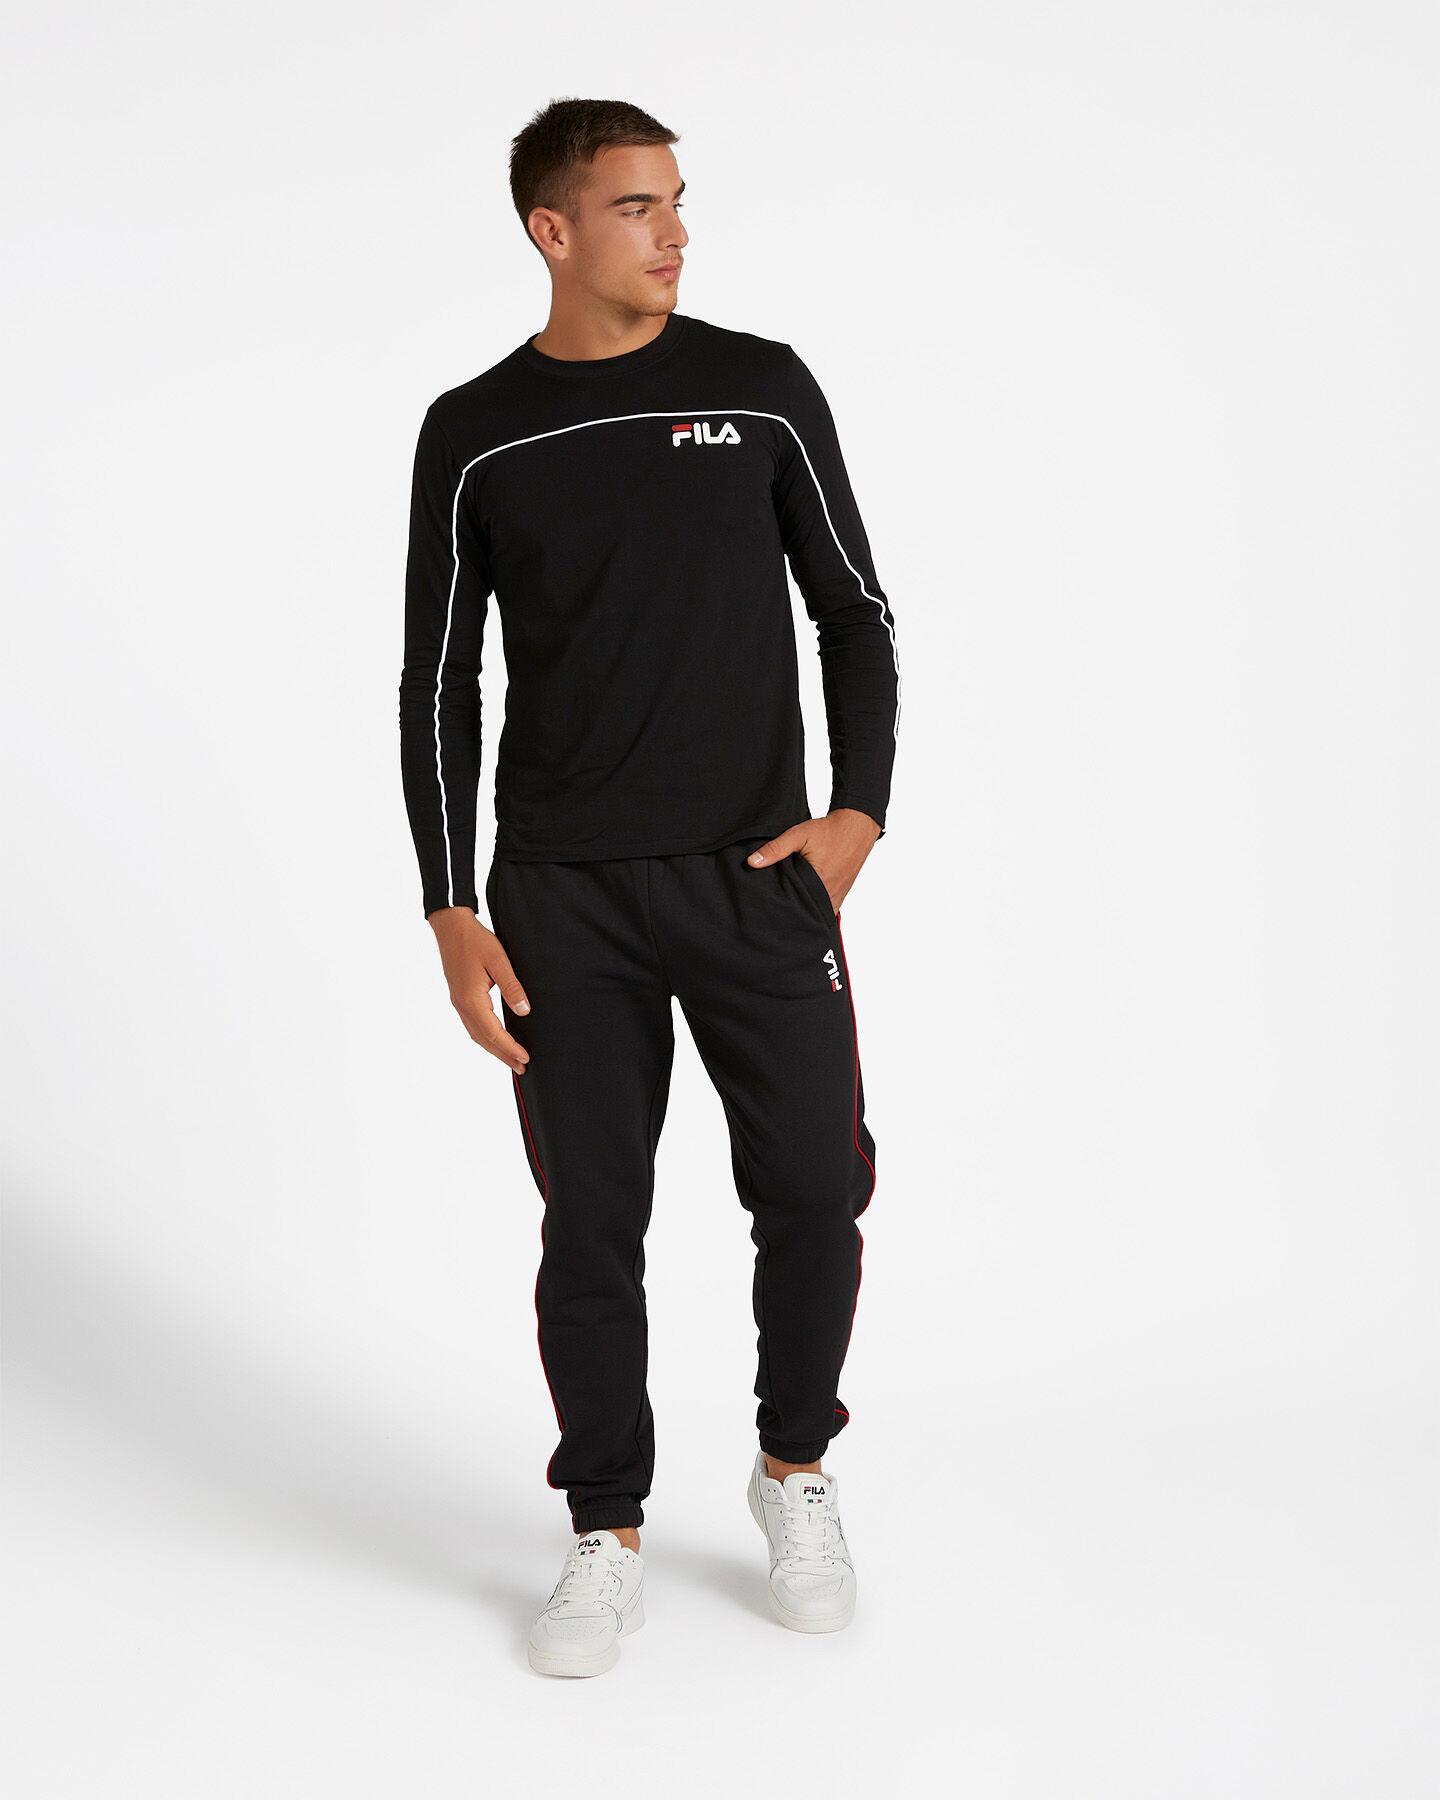 T-Shirt FILA LOGO M S4080475 scatto 1